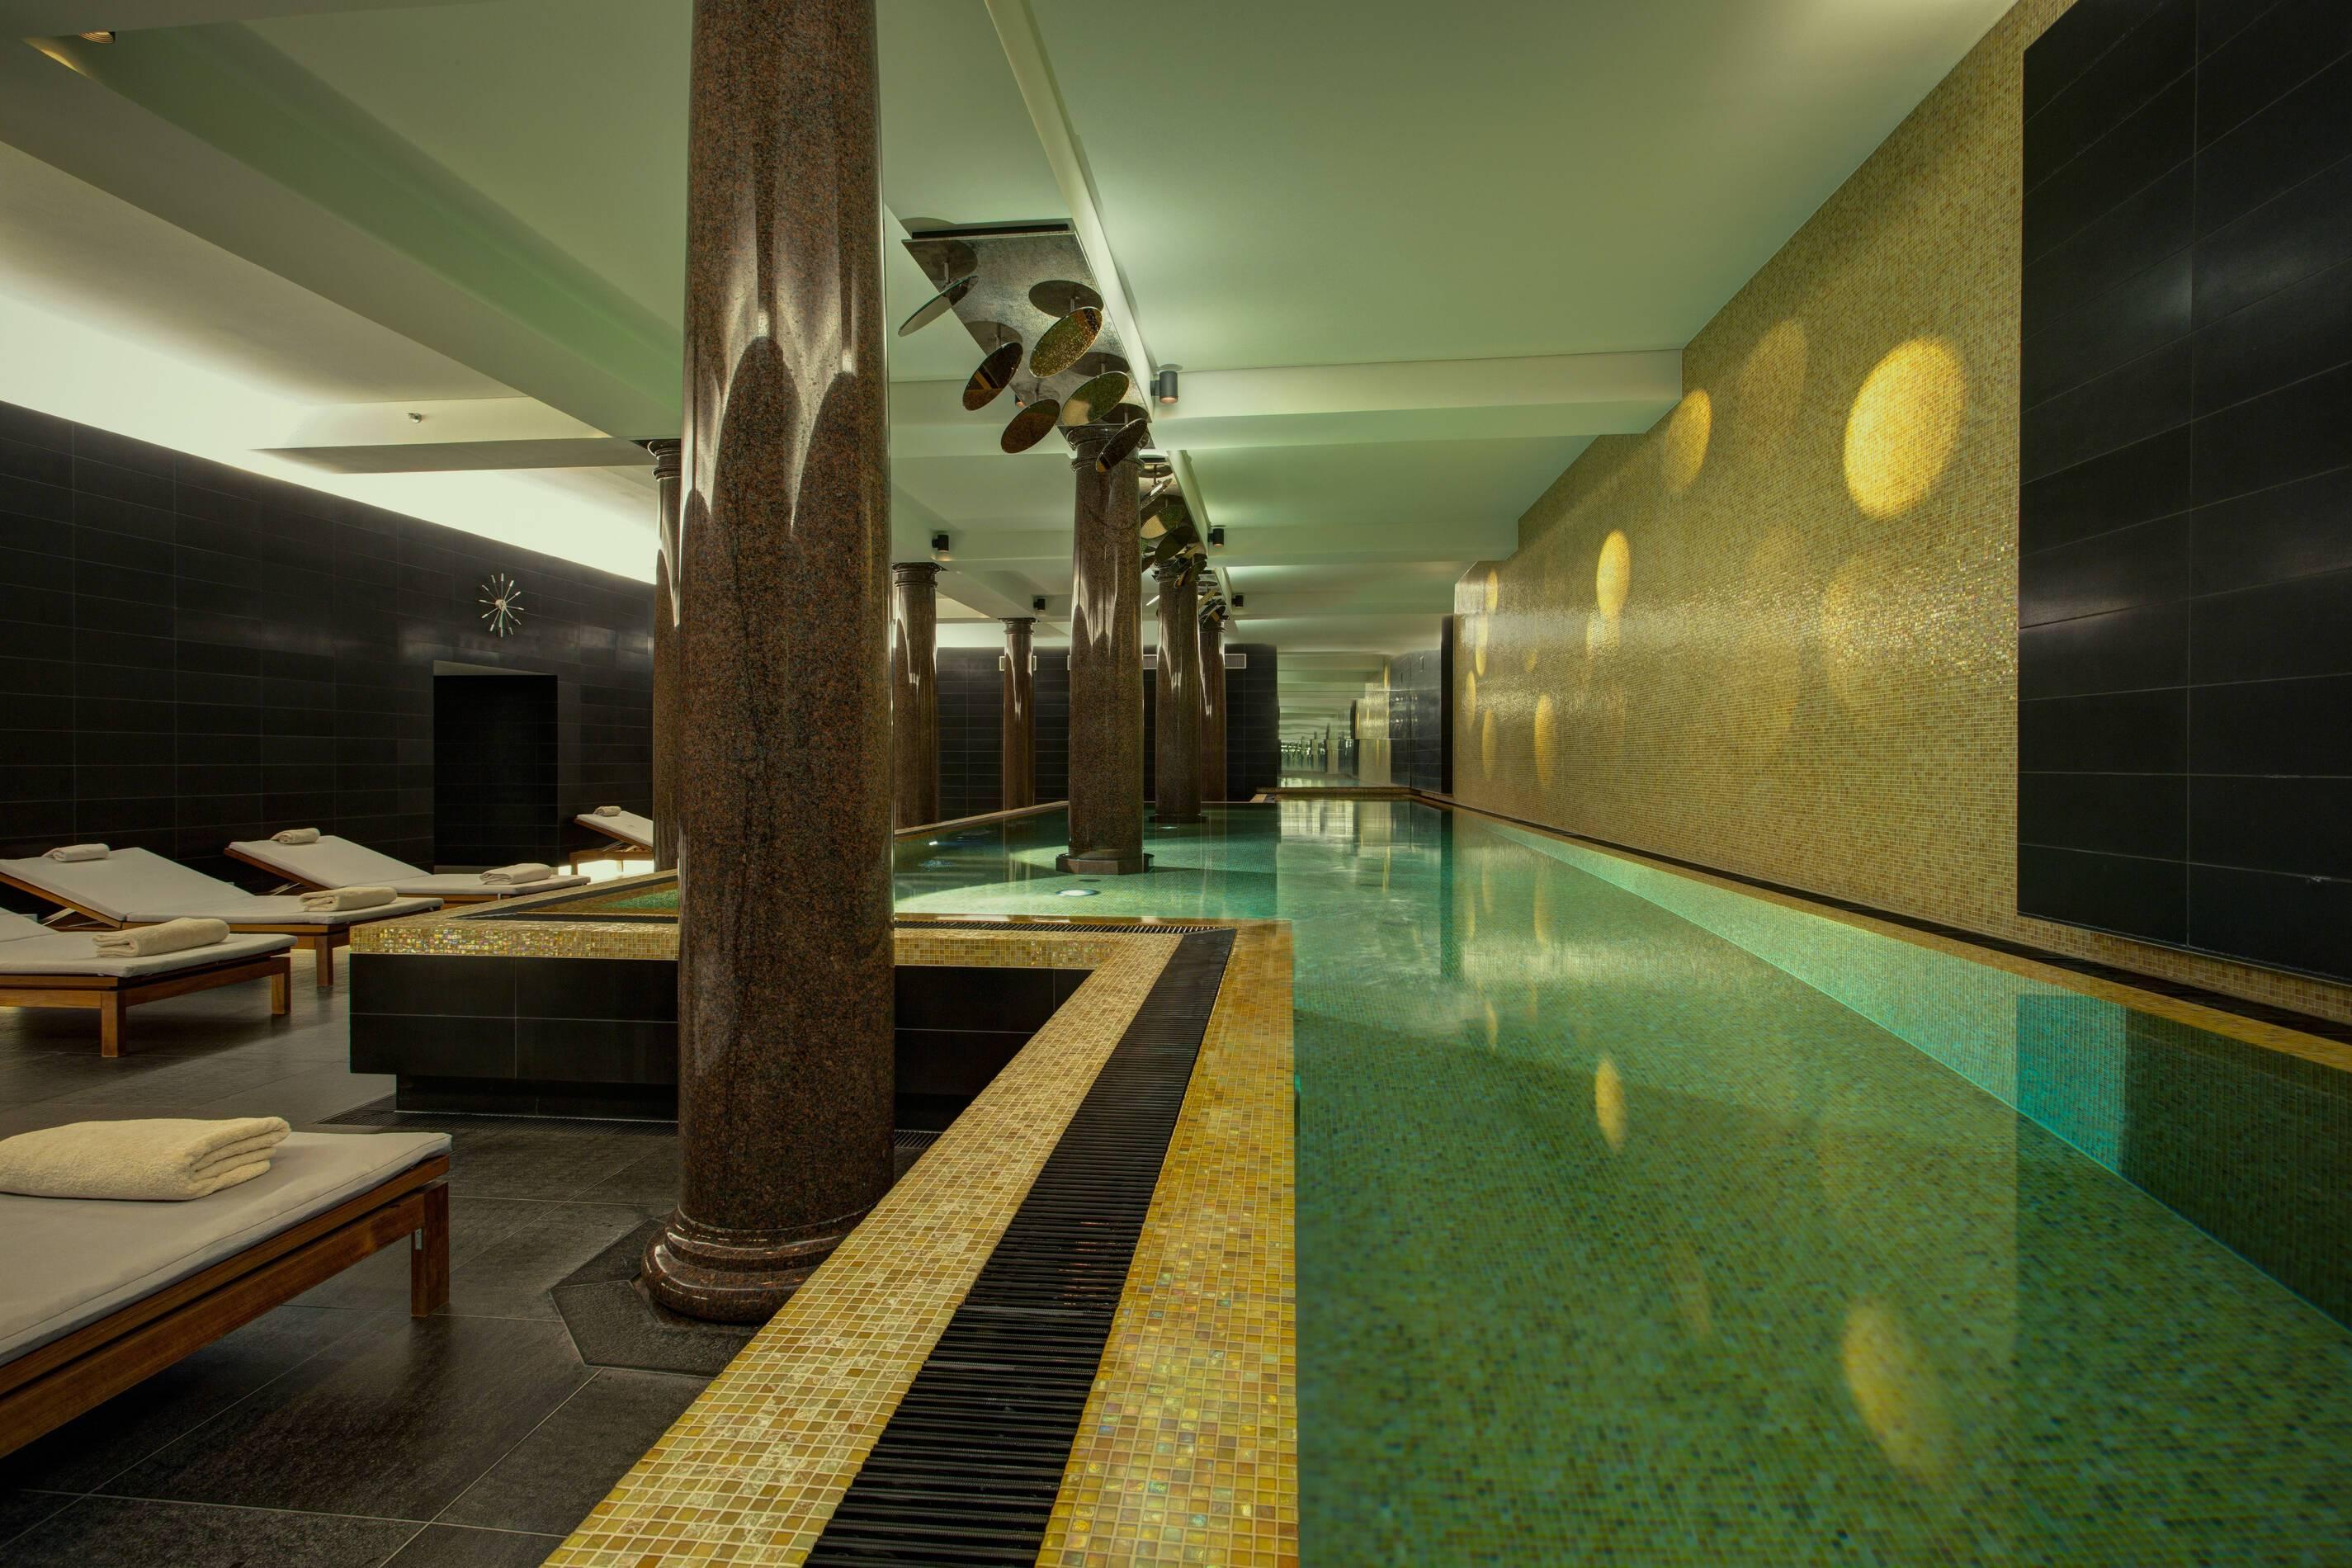 Hotel-de-Rome-Berlin-Rocco-Forte-Piscine